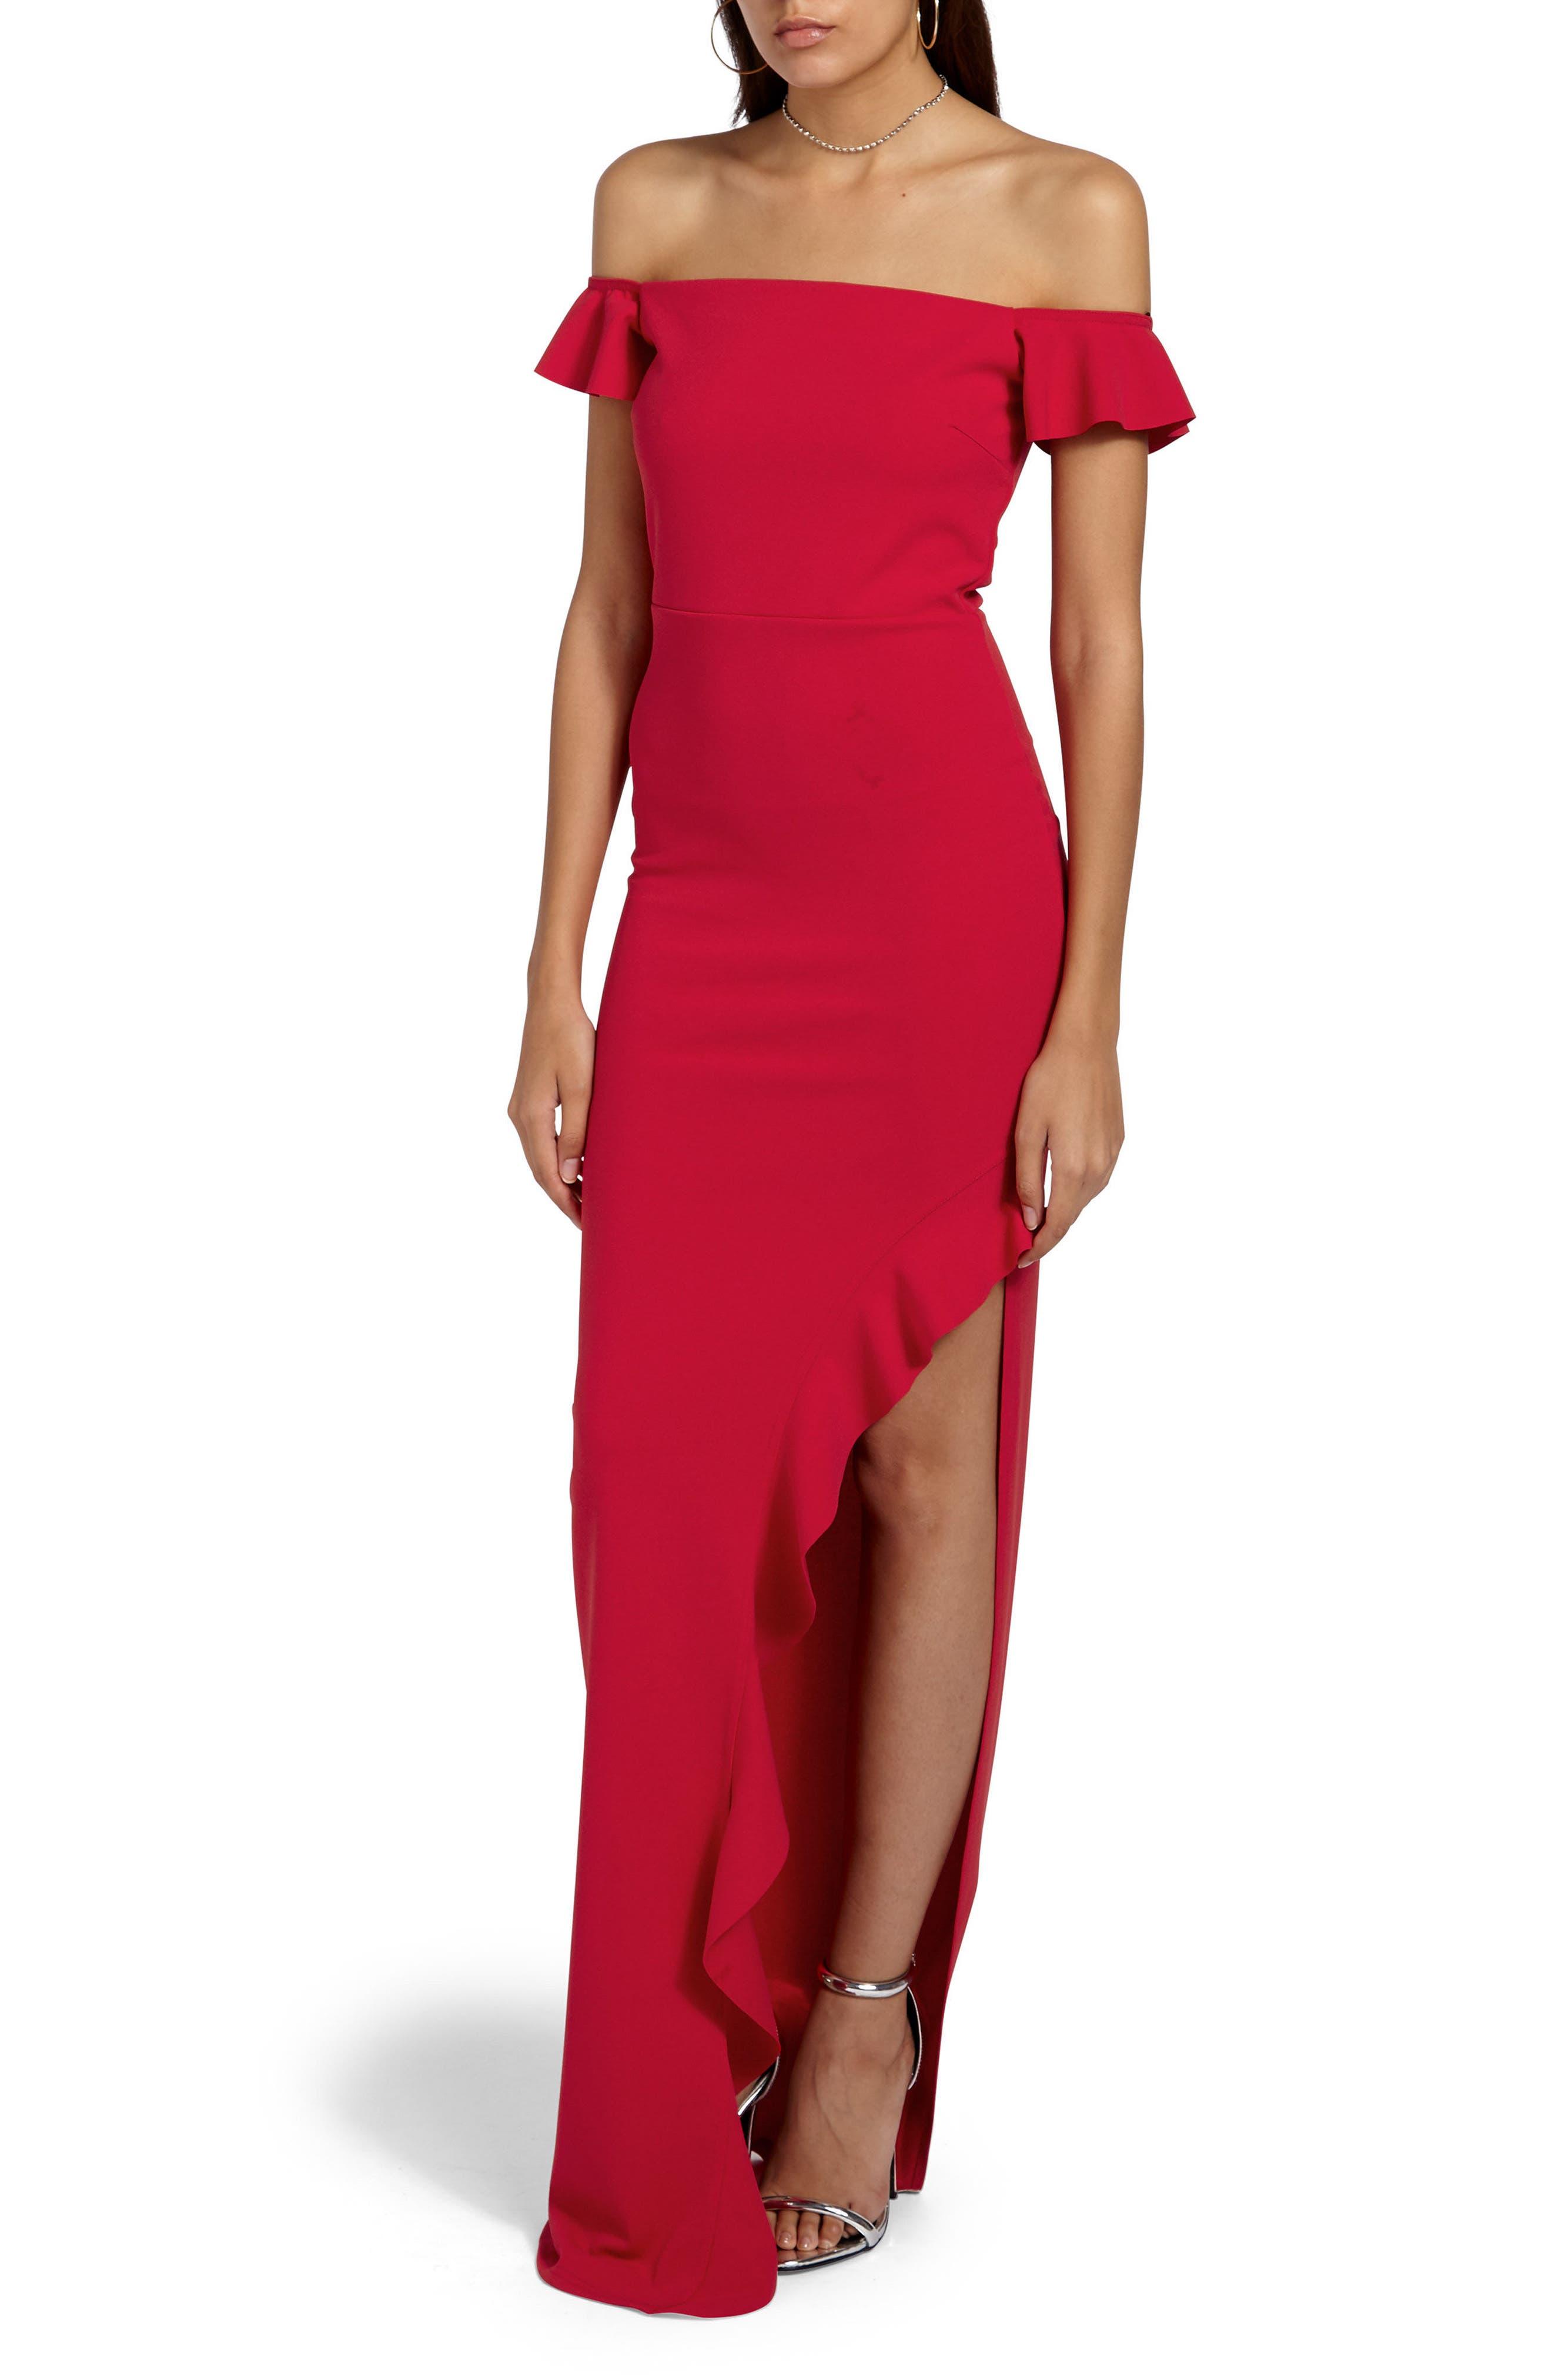 Bardot Gown,                         Main,                         color, 600